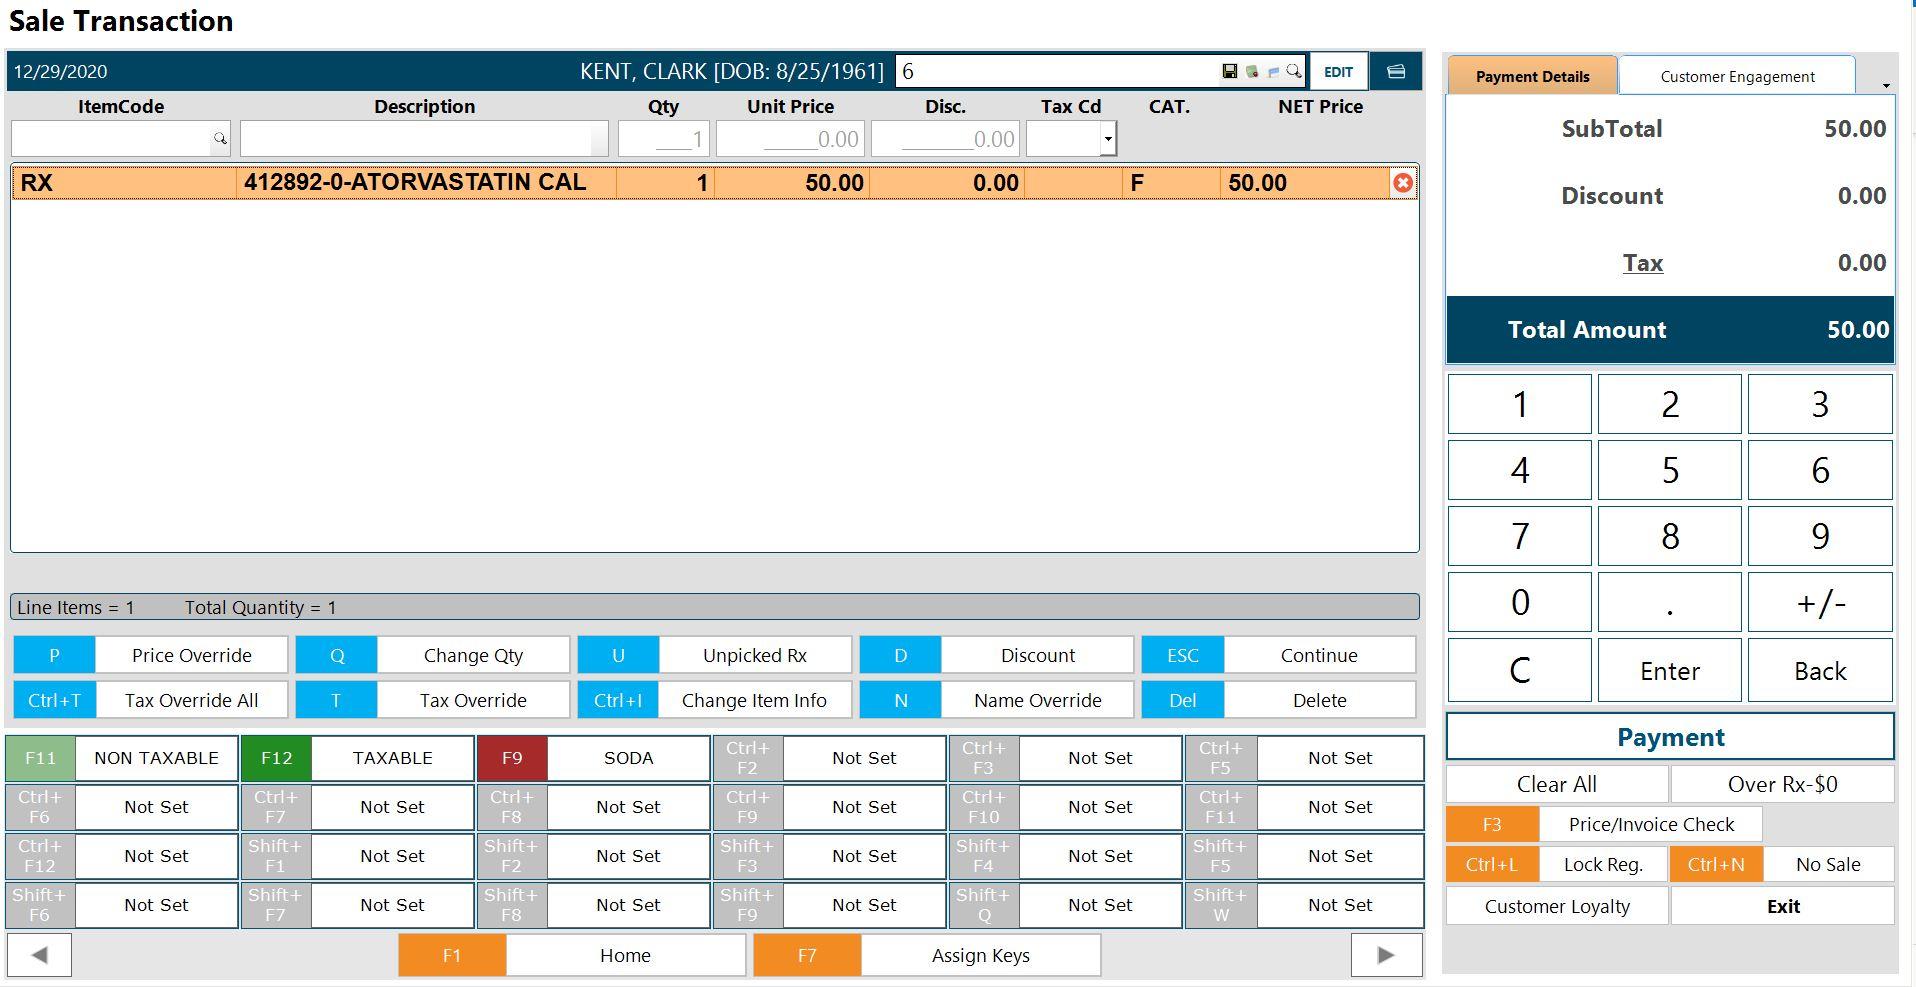 PrimePOS interface